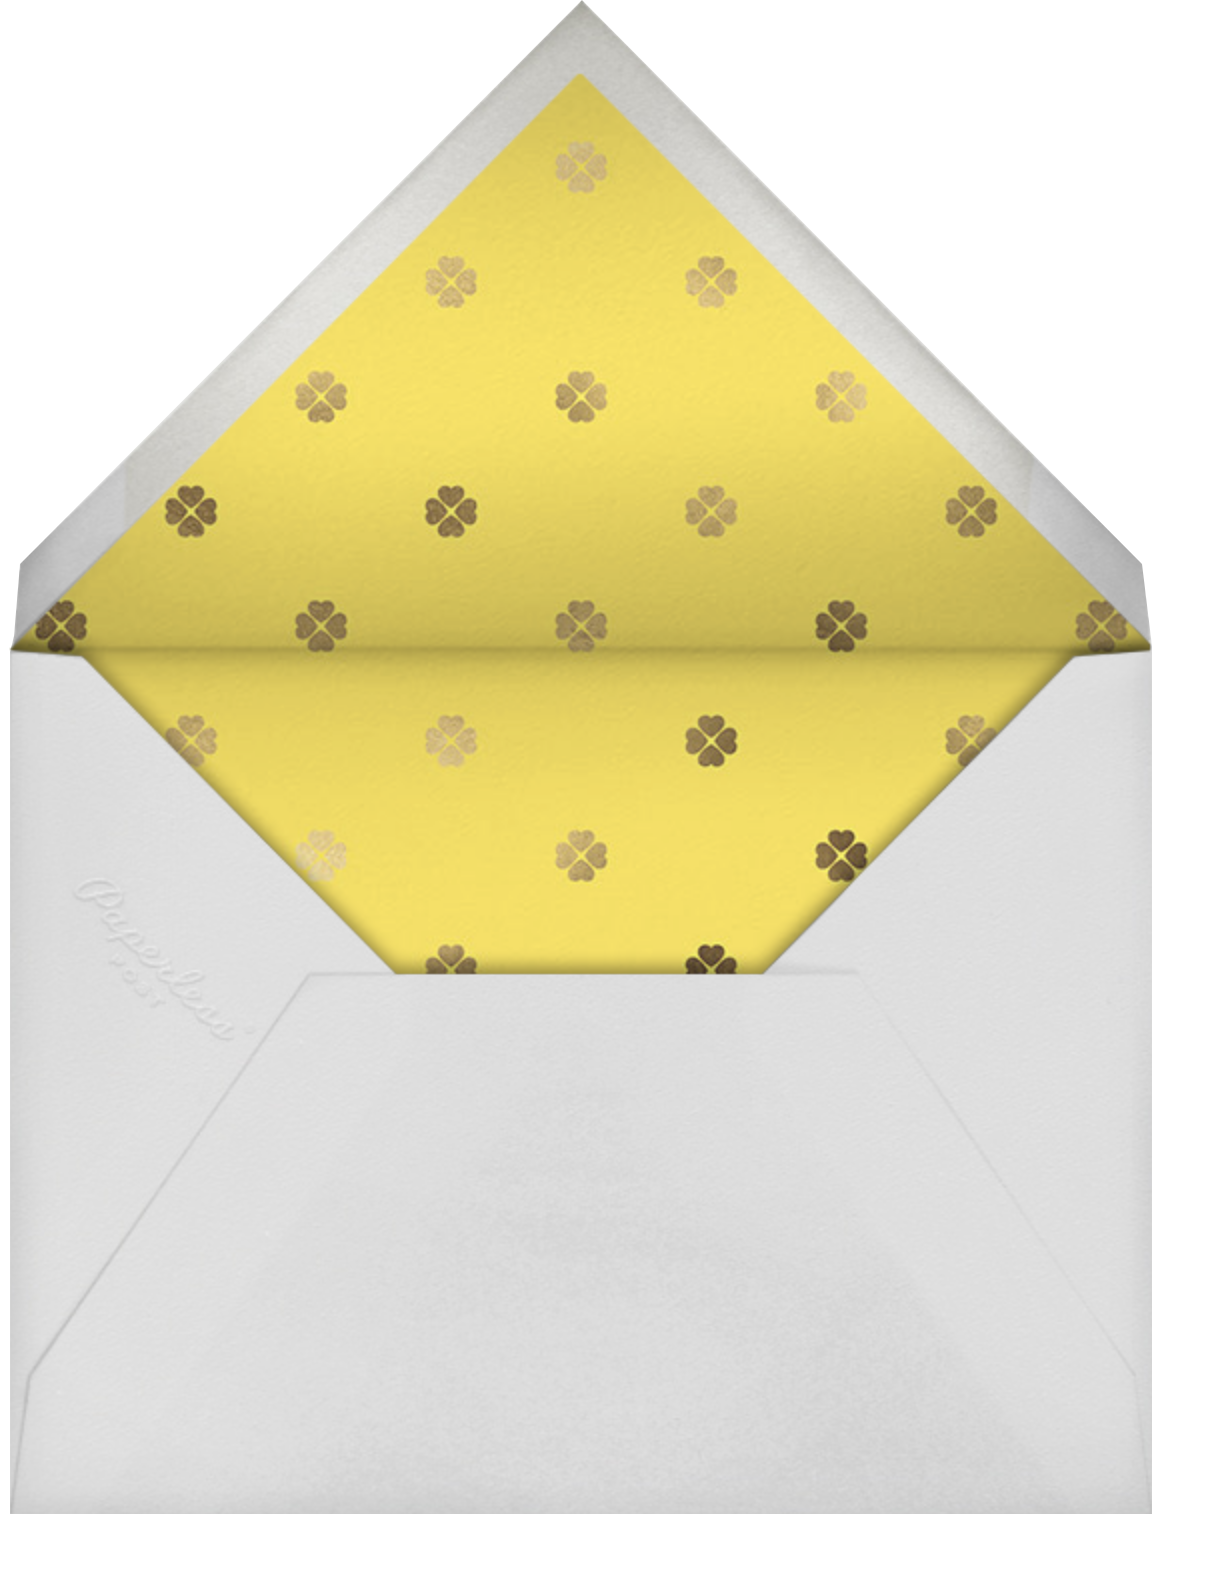 Colorblocked Stripes - Yellow/Pavlova - kate spade new york - Baby shower - envelope back